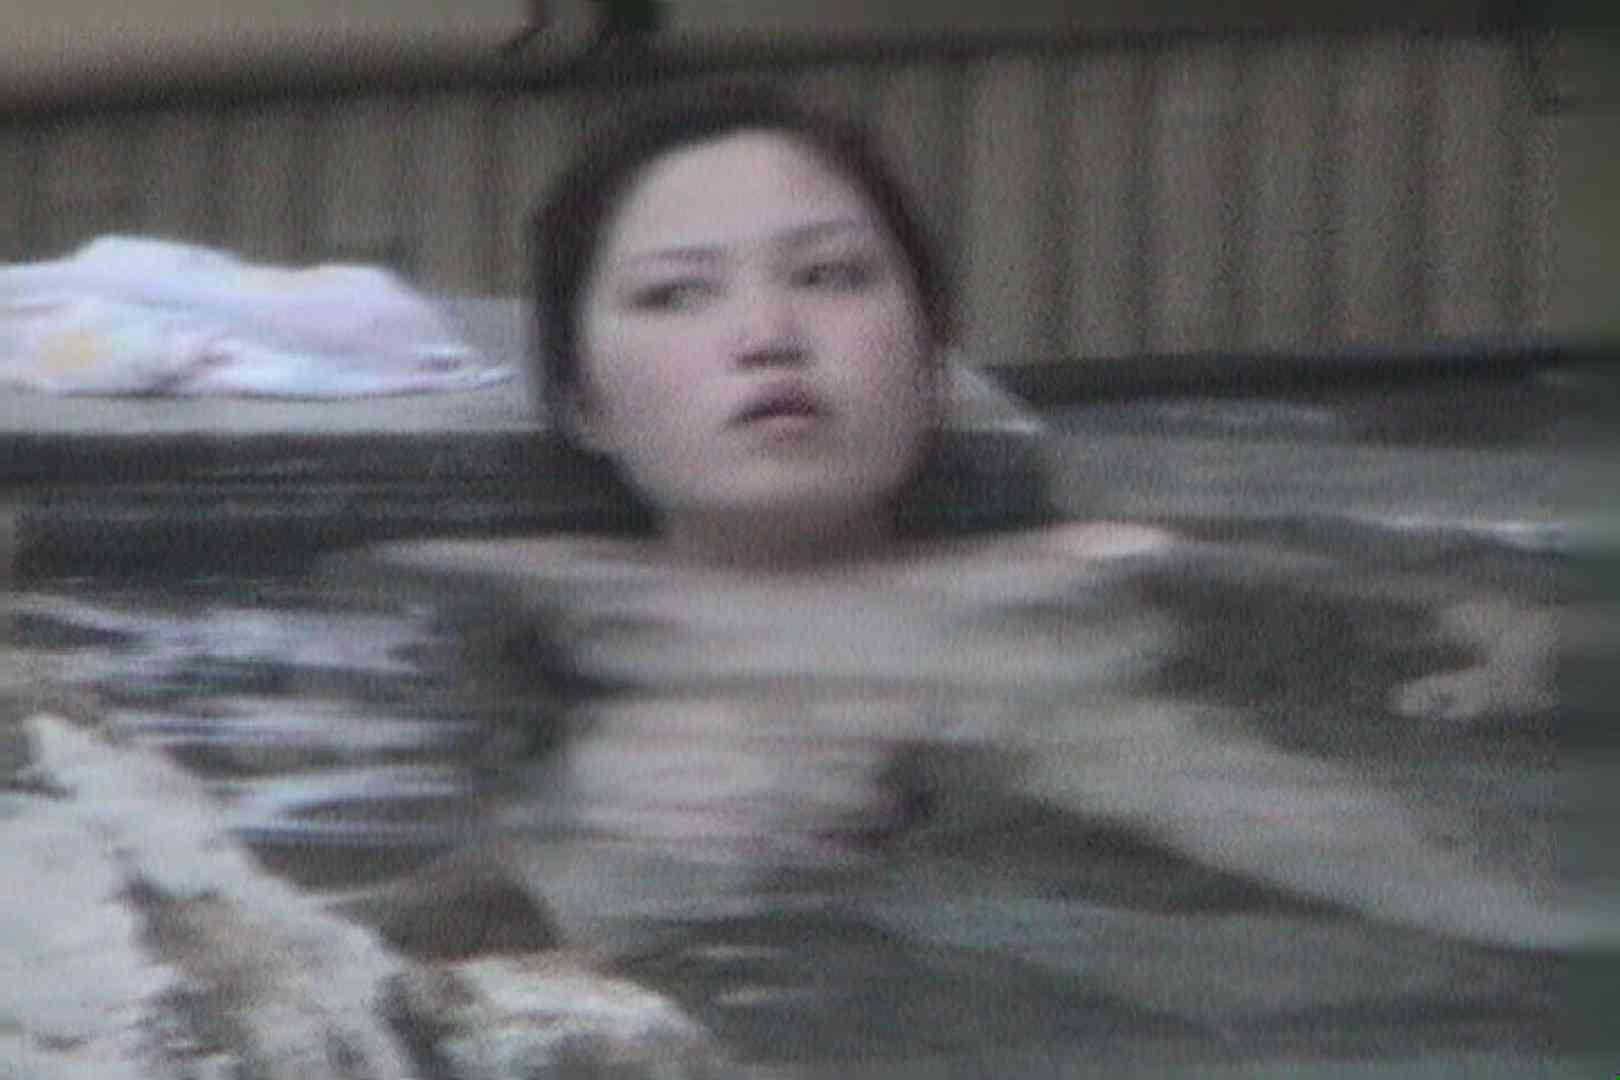 Aquaな露天風呂Vol.602 OLセックス 盗み撮りオマンコ動画キャプチャ 70画像 68